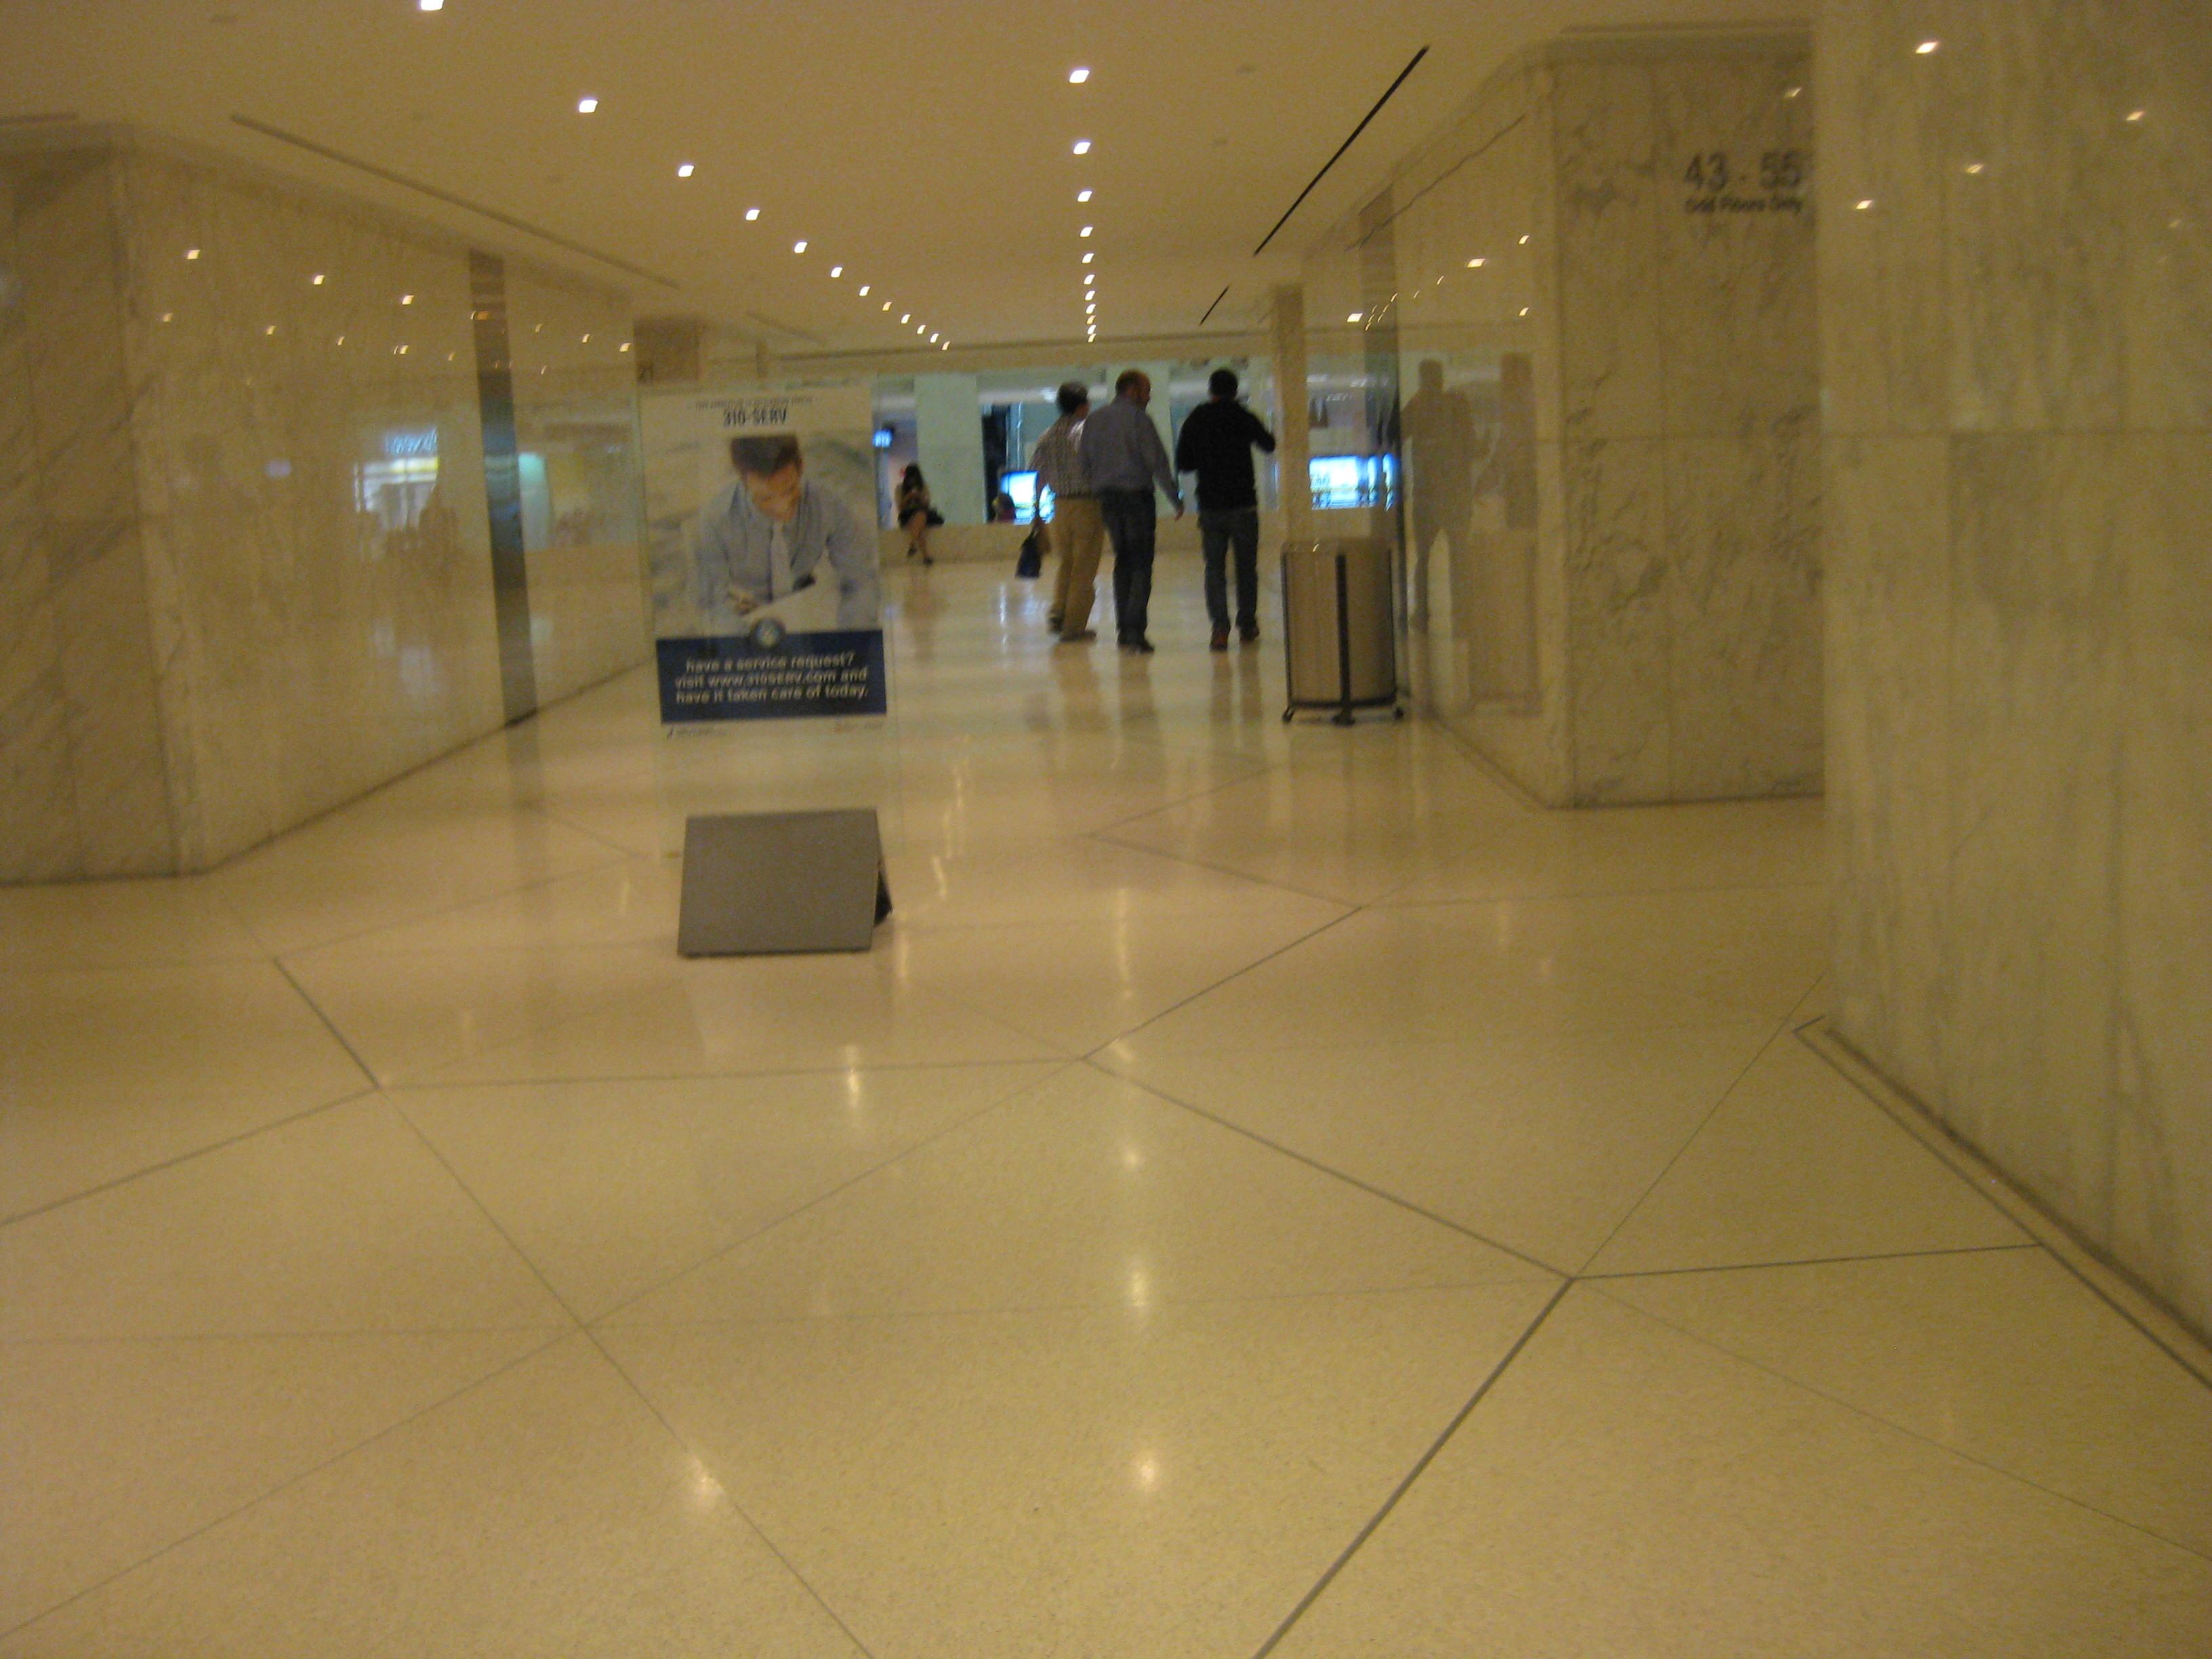 The Shoe Company Scotia Plaza